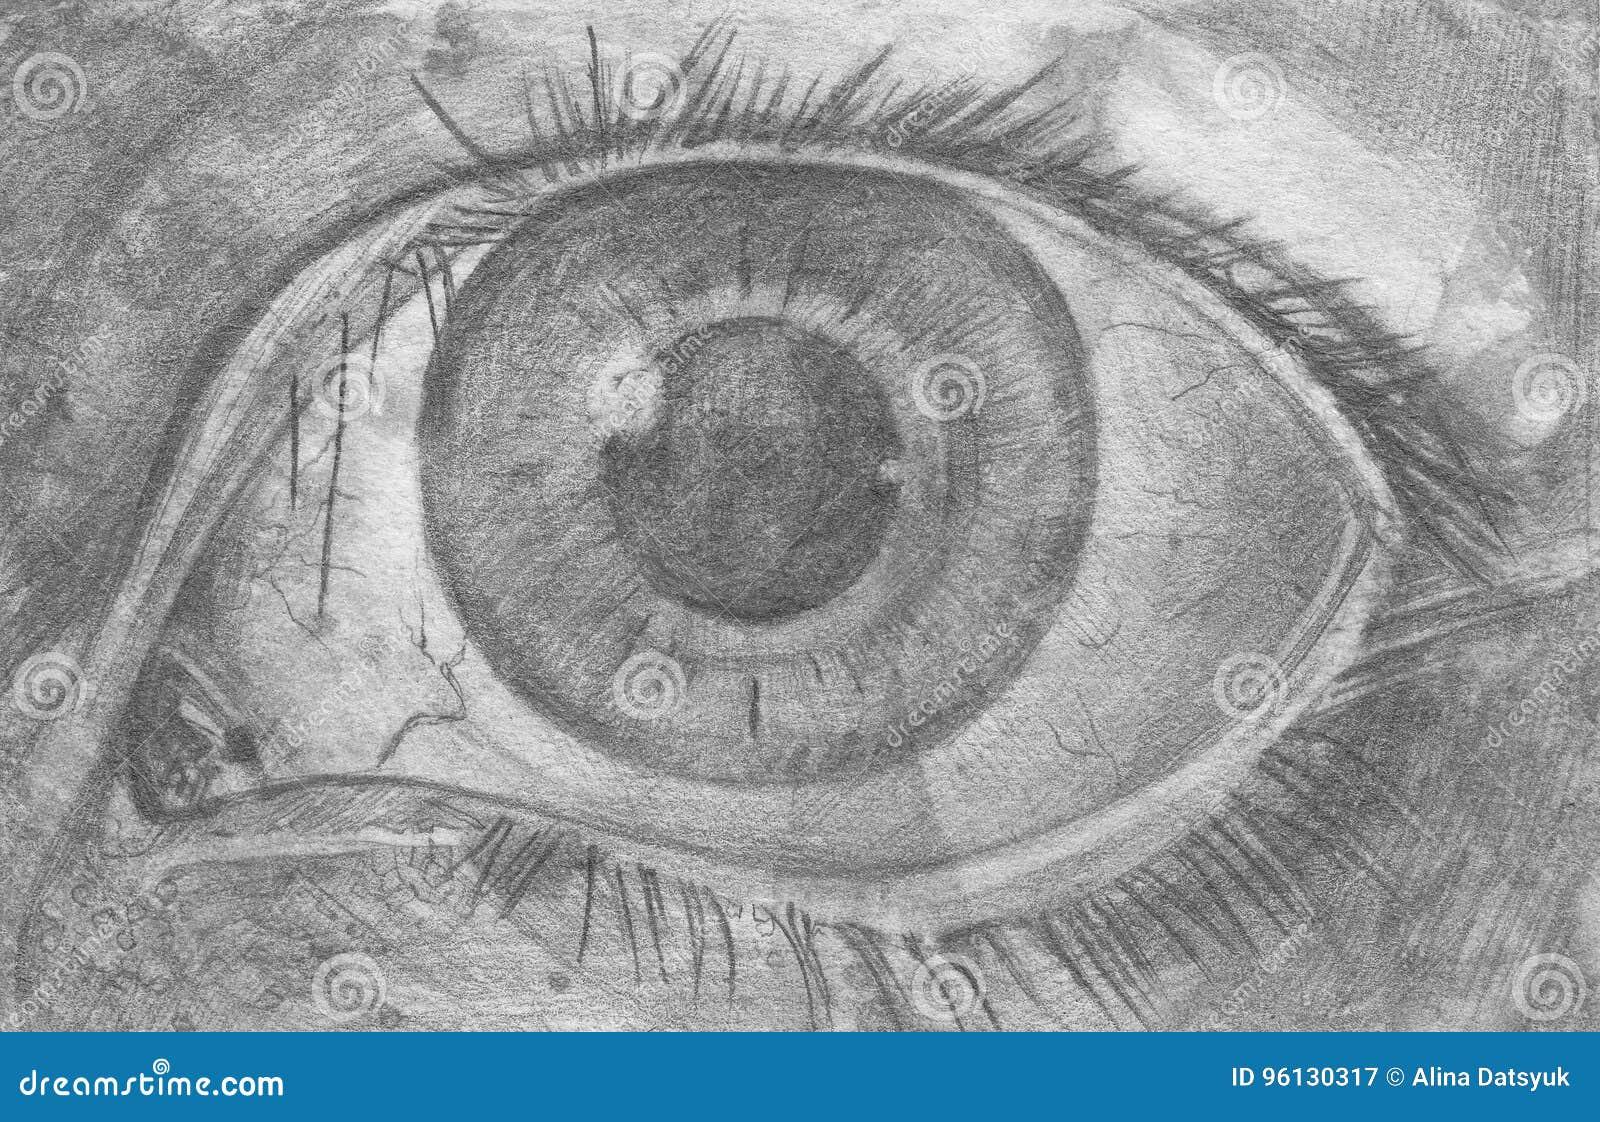 Eyes pencil sketch of eyes stock illustration illustration of